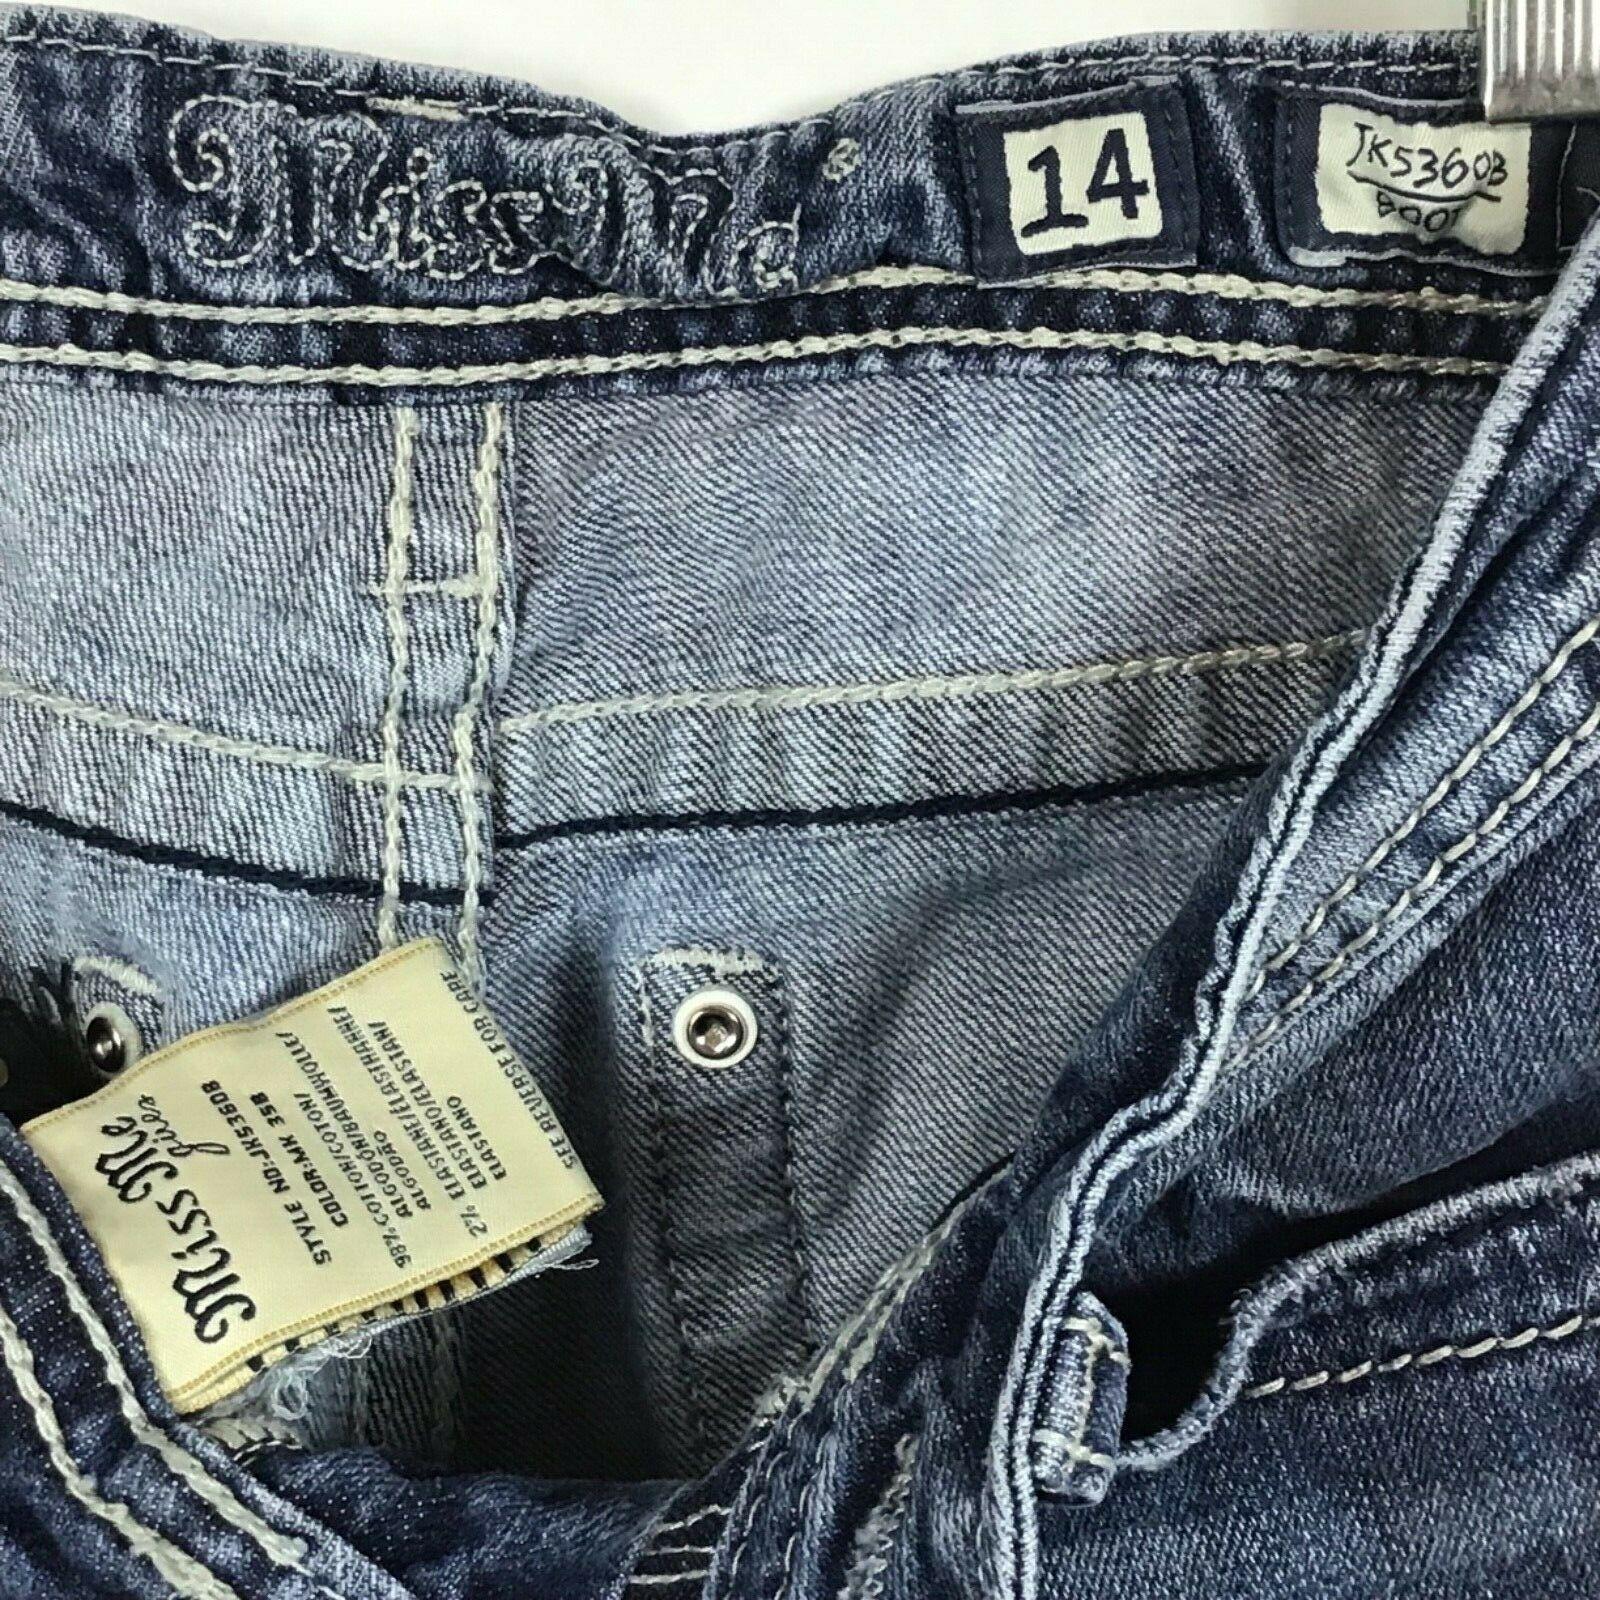 Miss Me Jeans Girls Size 14 Jeans Fleur De Lis BLING Bootcut Distressed B6-9 image 6